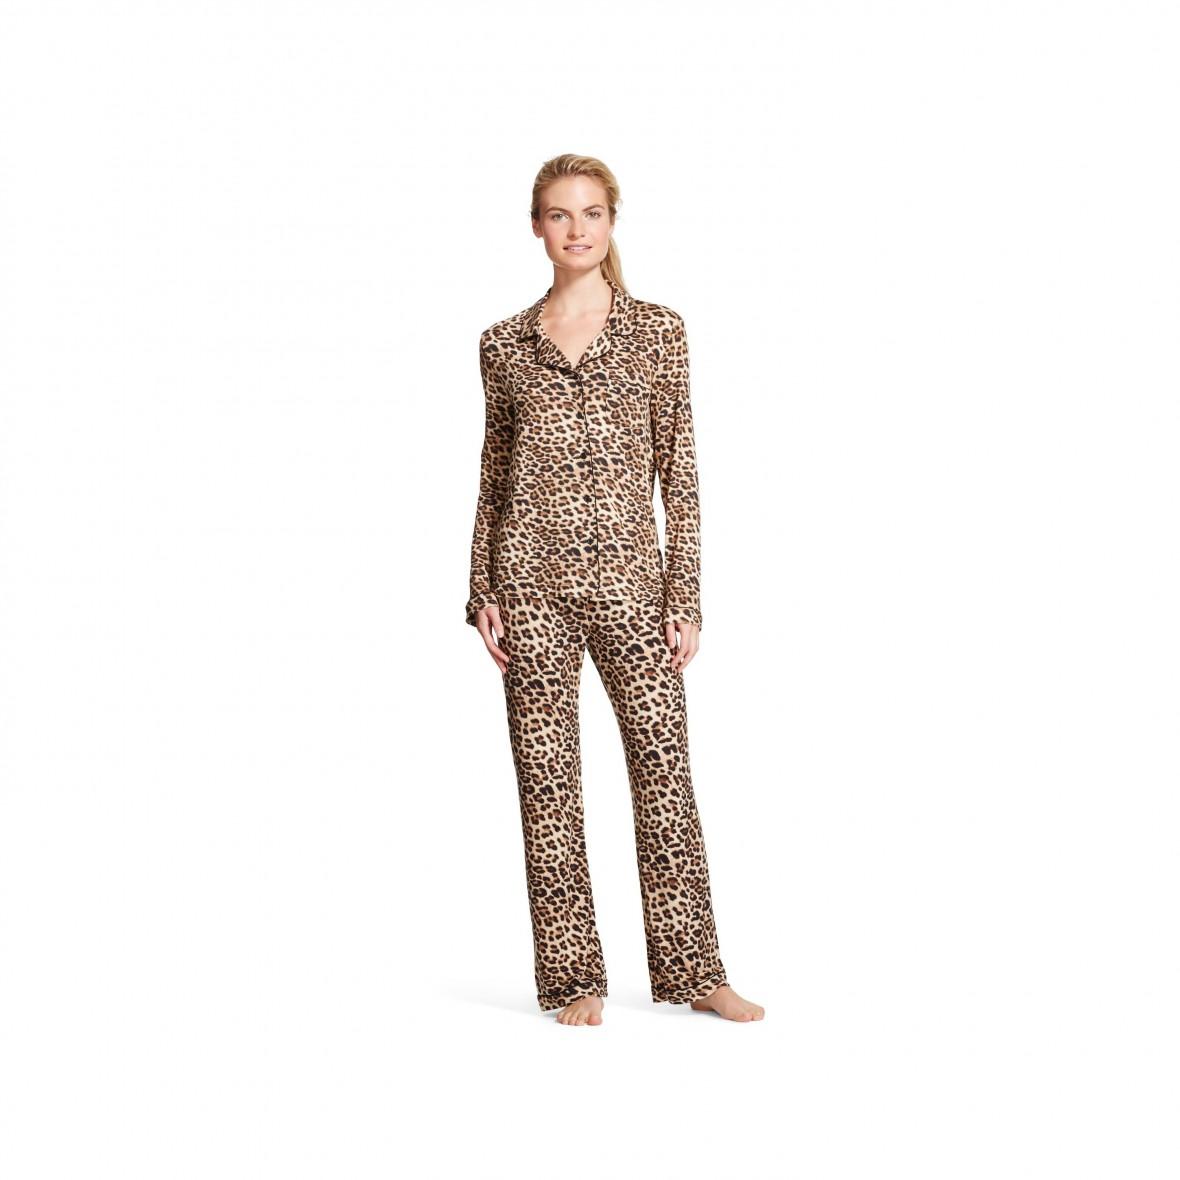 Leopard Print PJs from Target